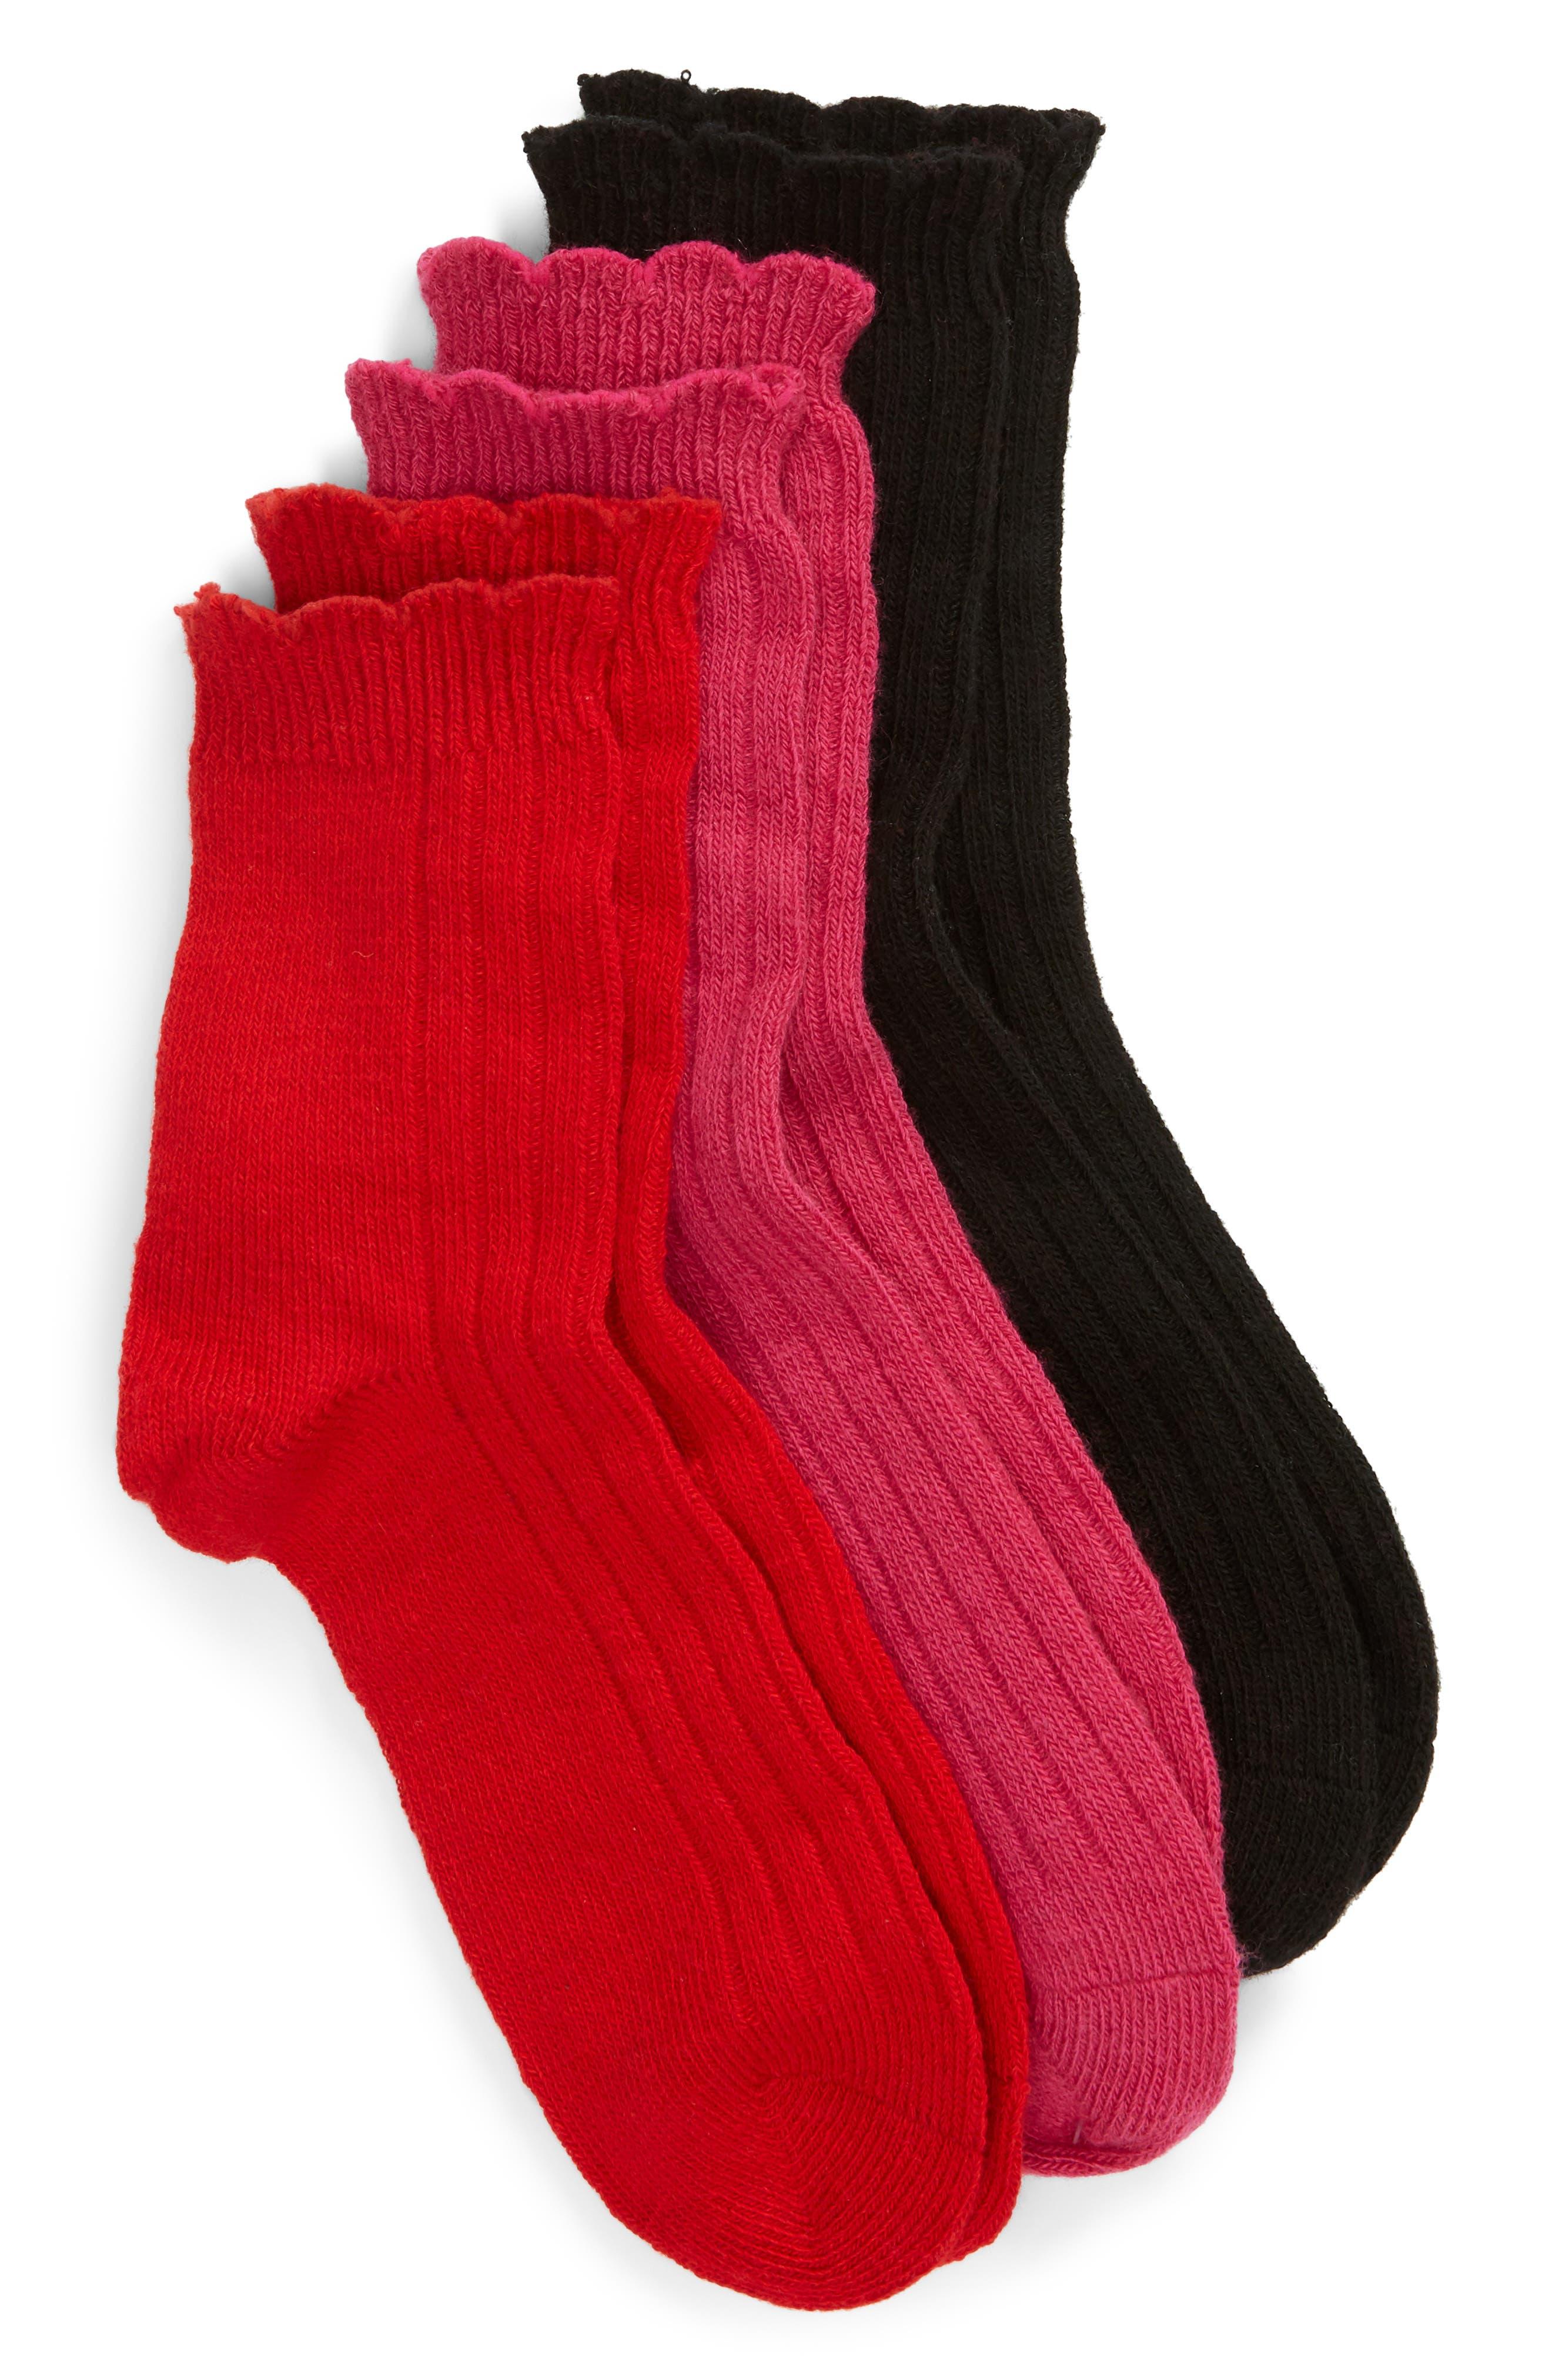 Assorted 3-Pack Crew Socks,                         Main,                         color, MULTI 2